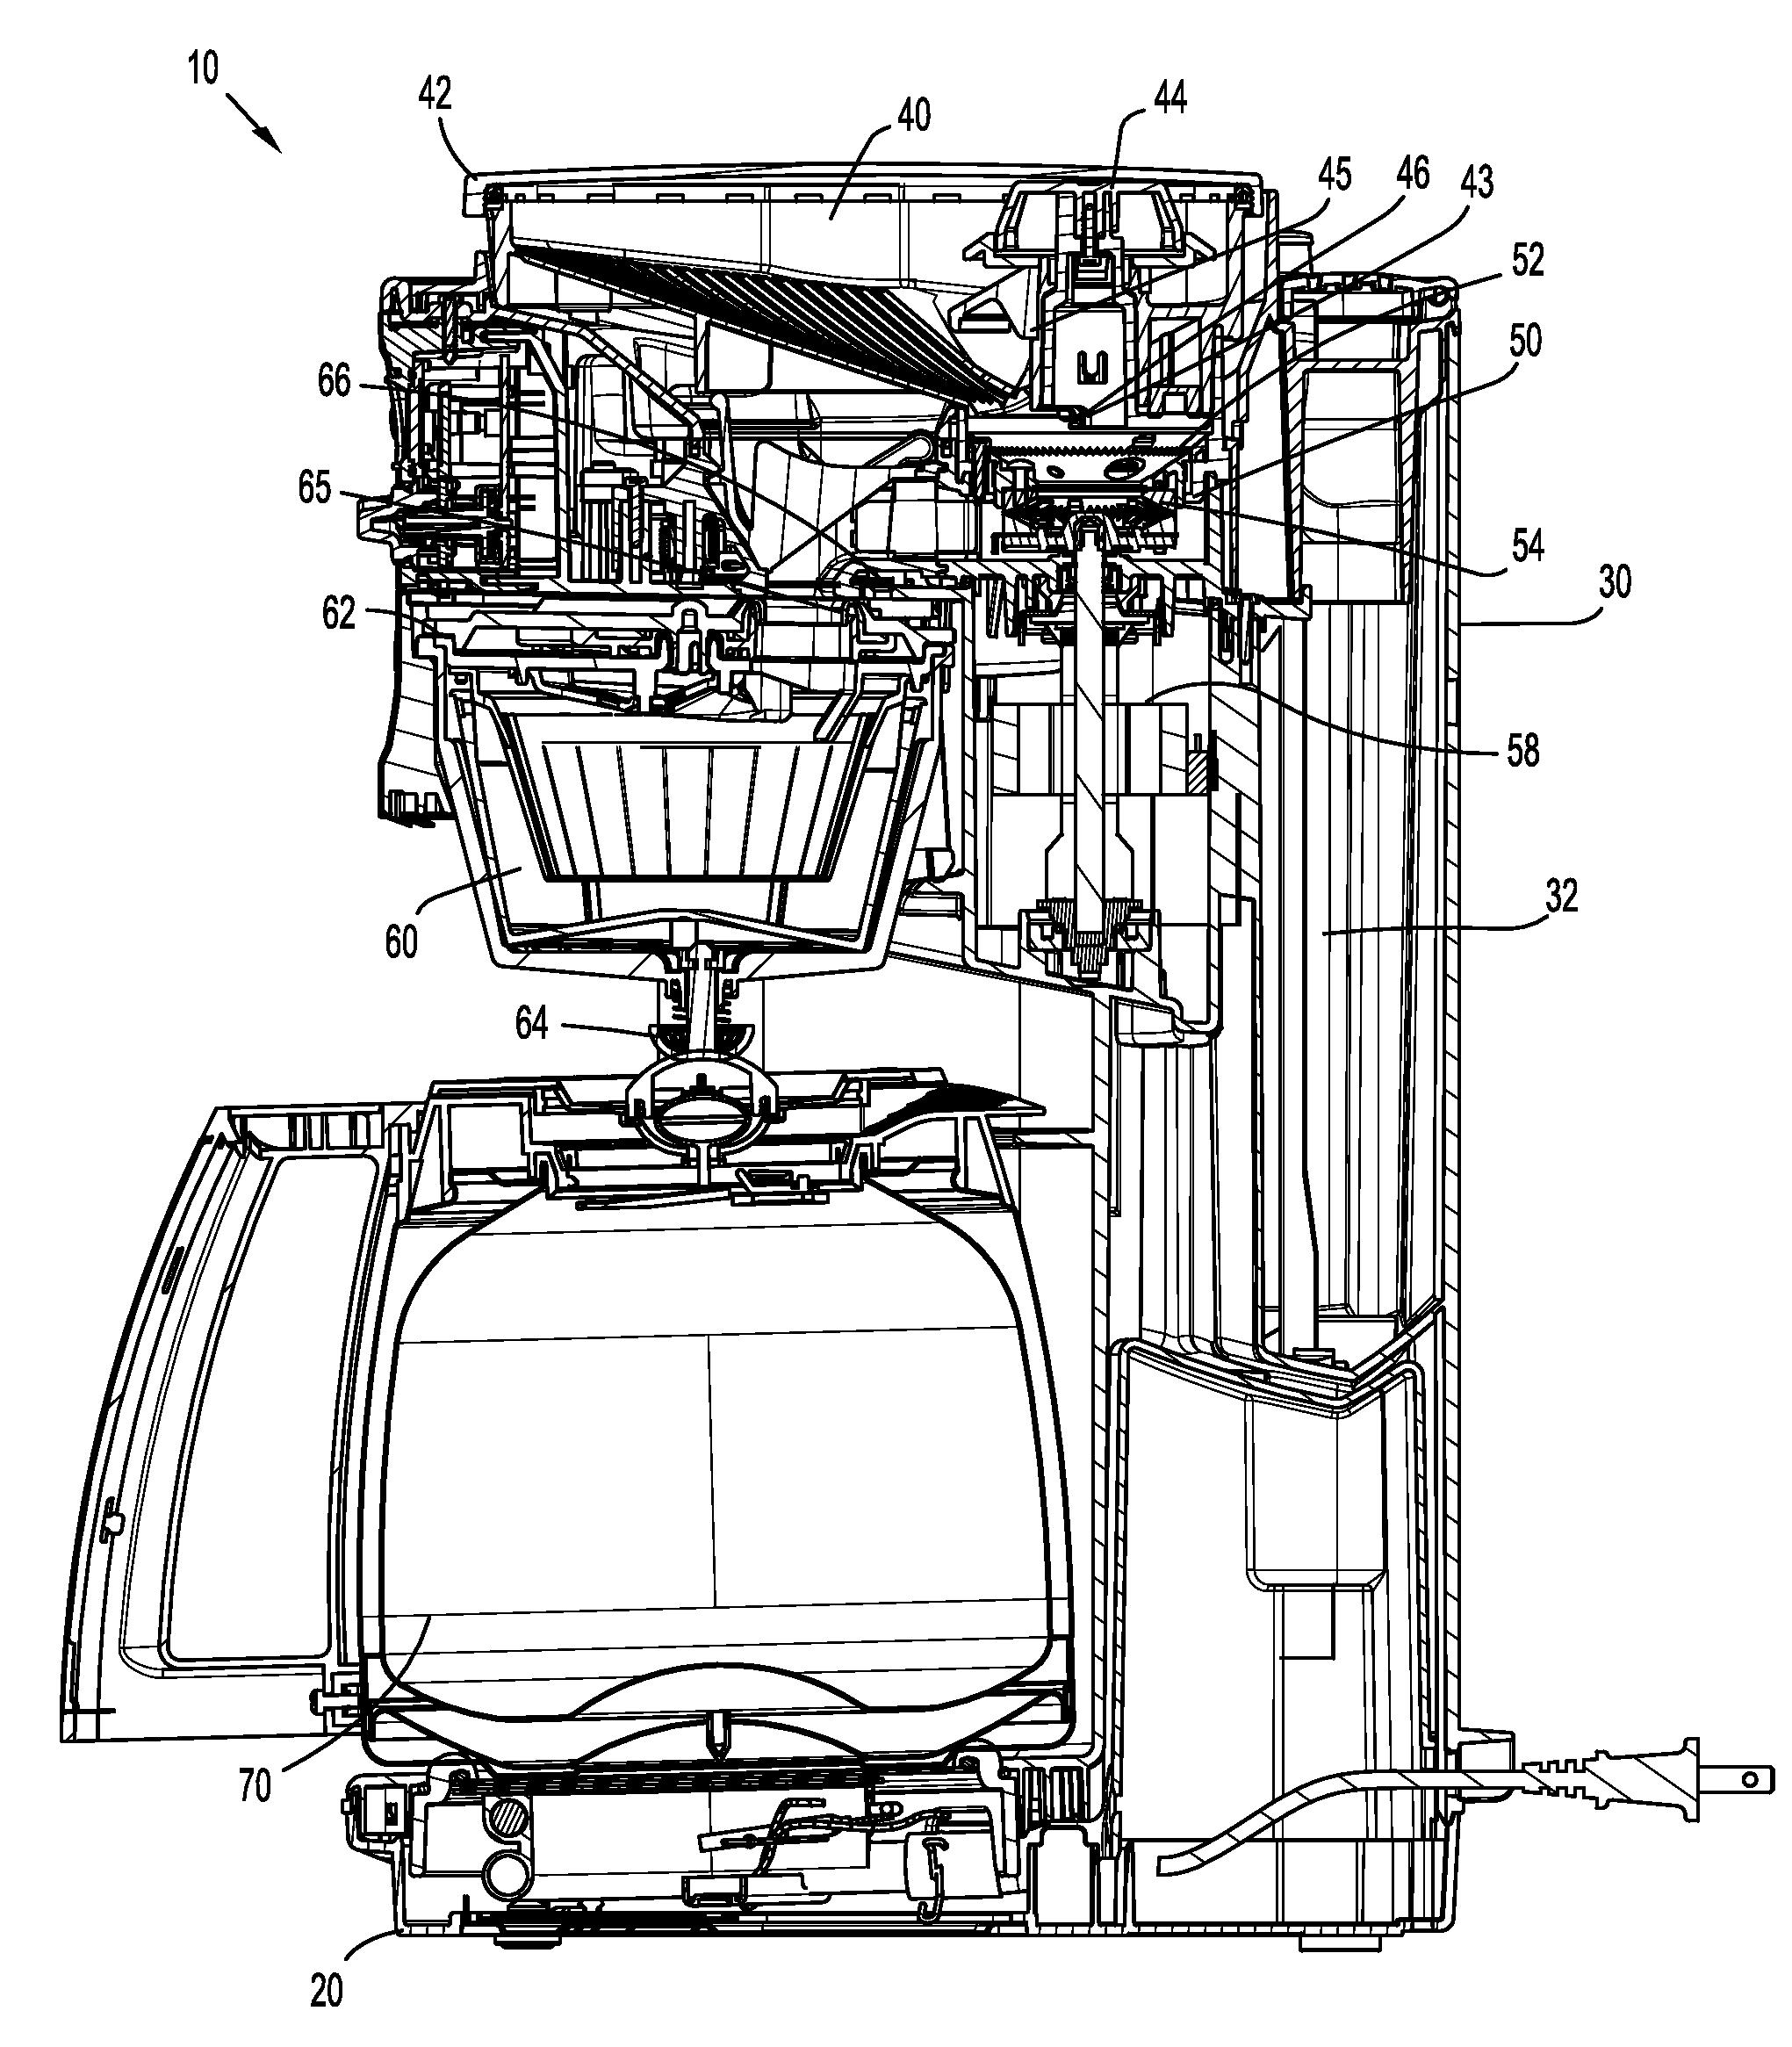 Patent US20090031900 - Coffee maker - Google Patents